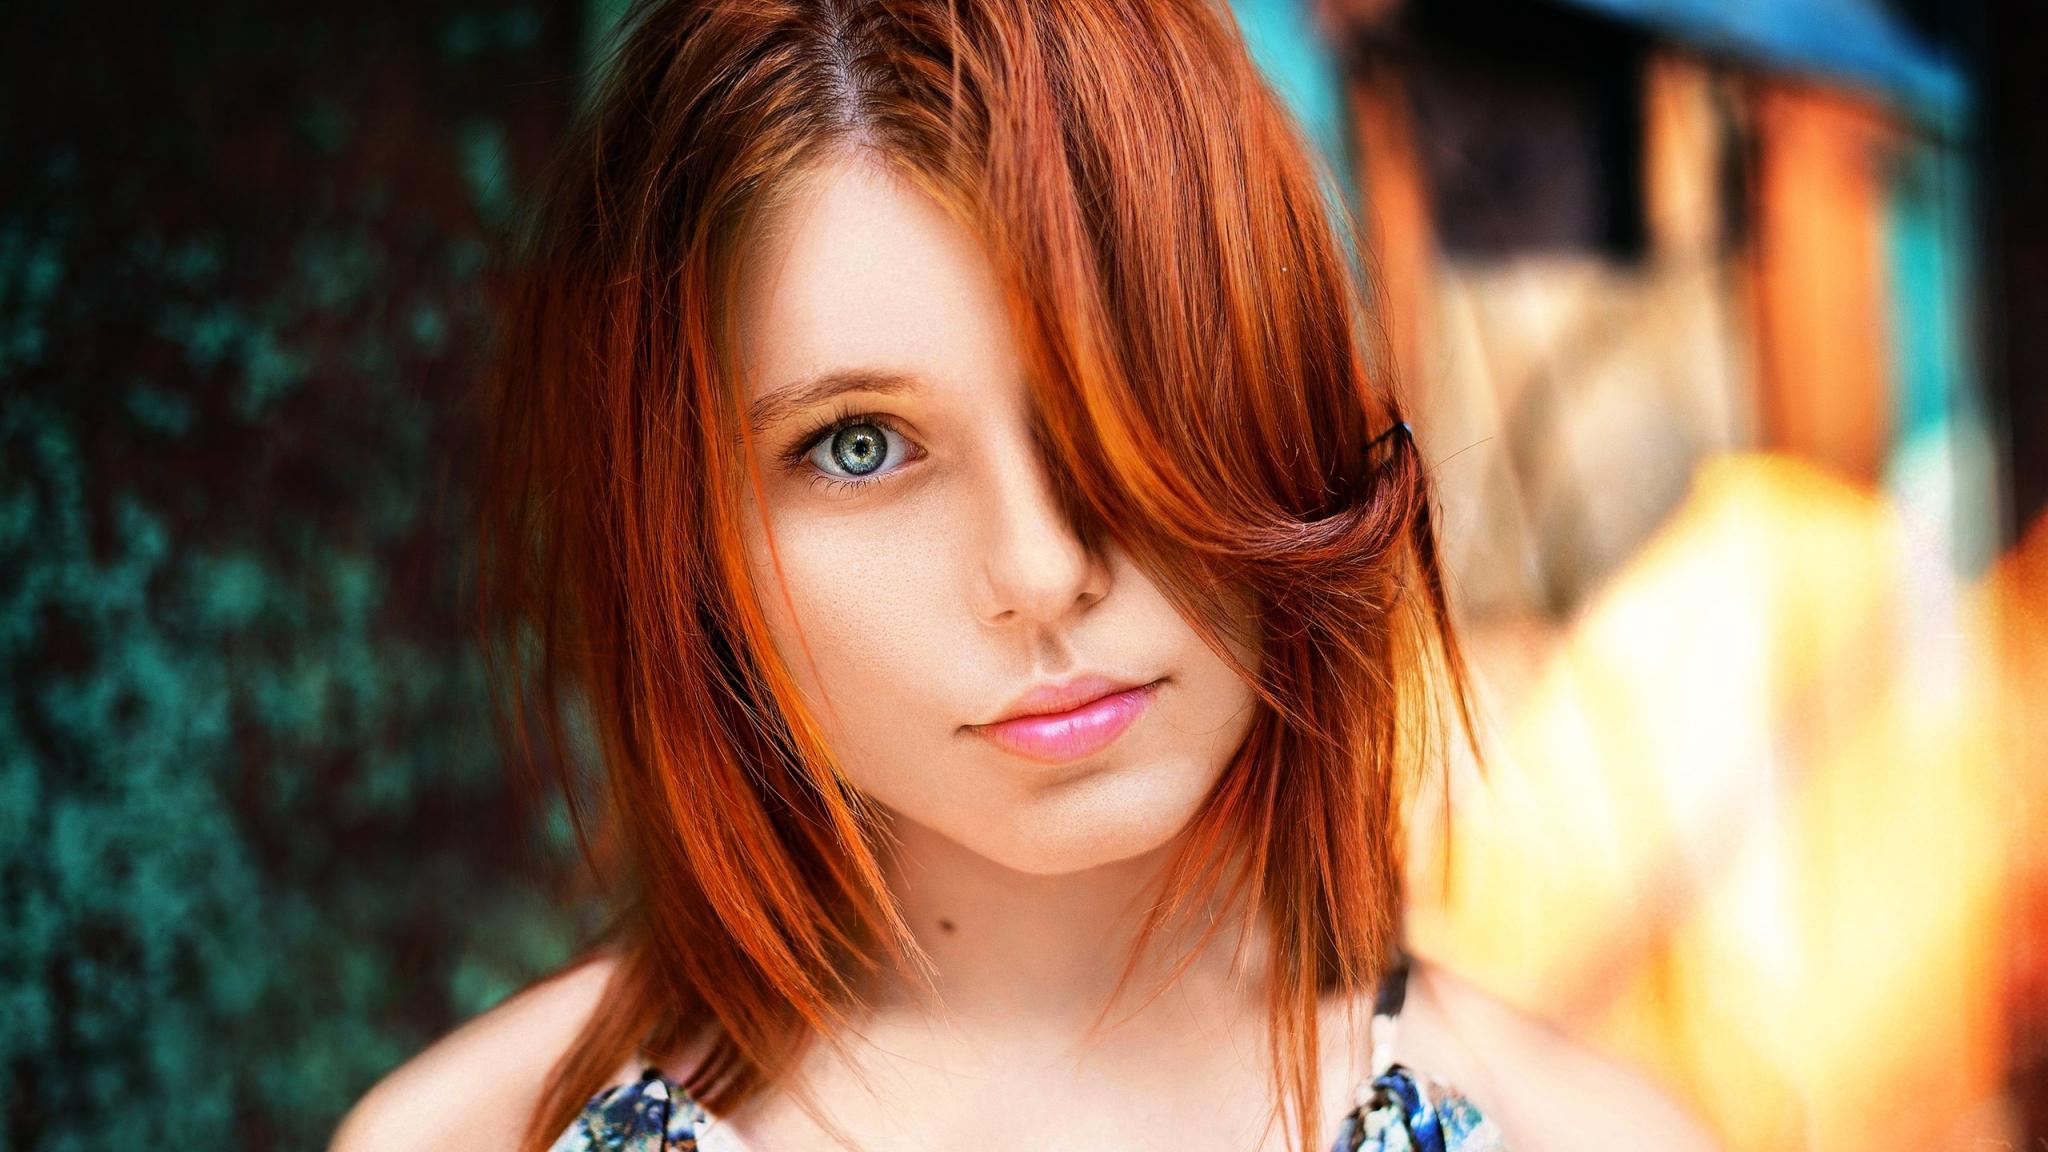 redhead-girl-videos